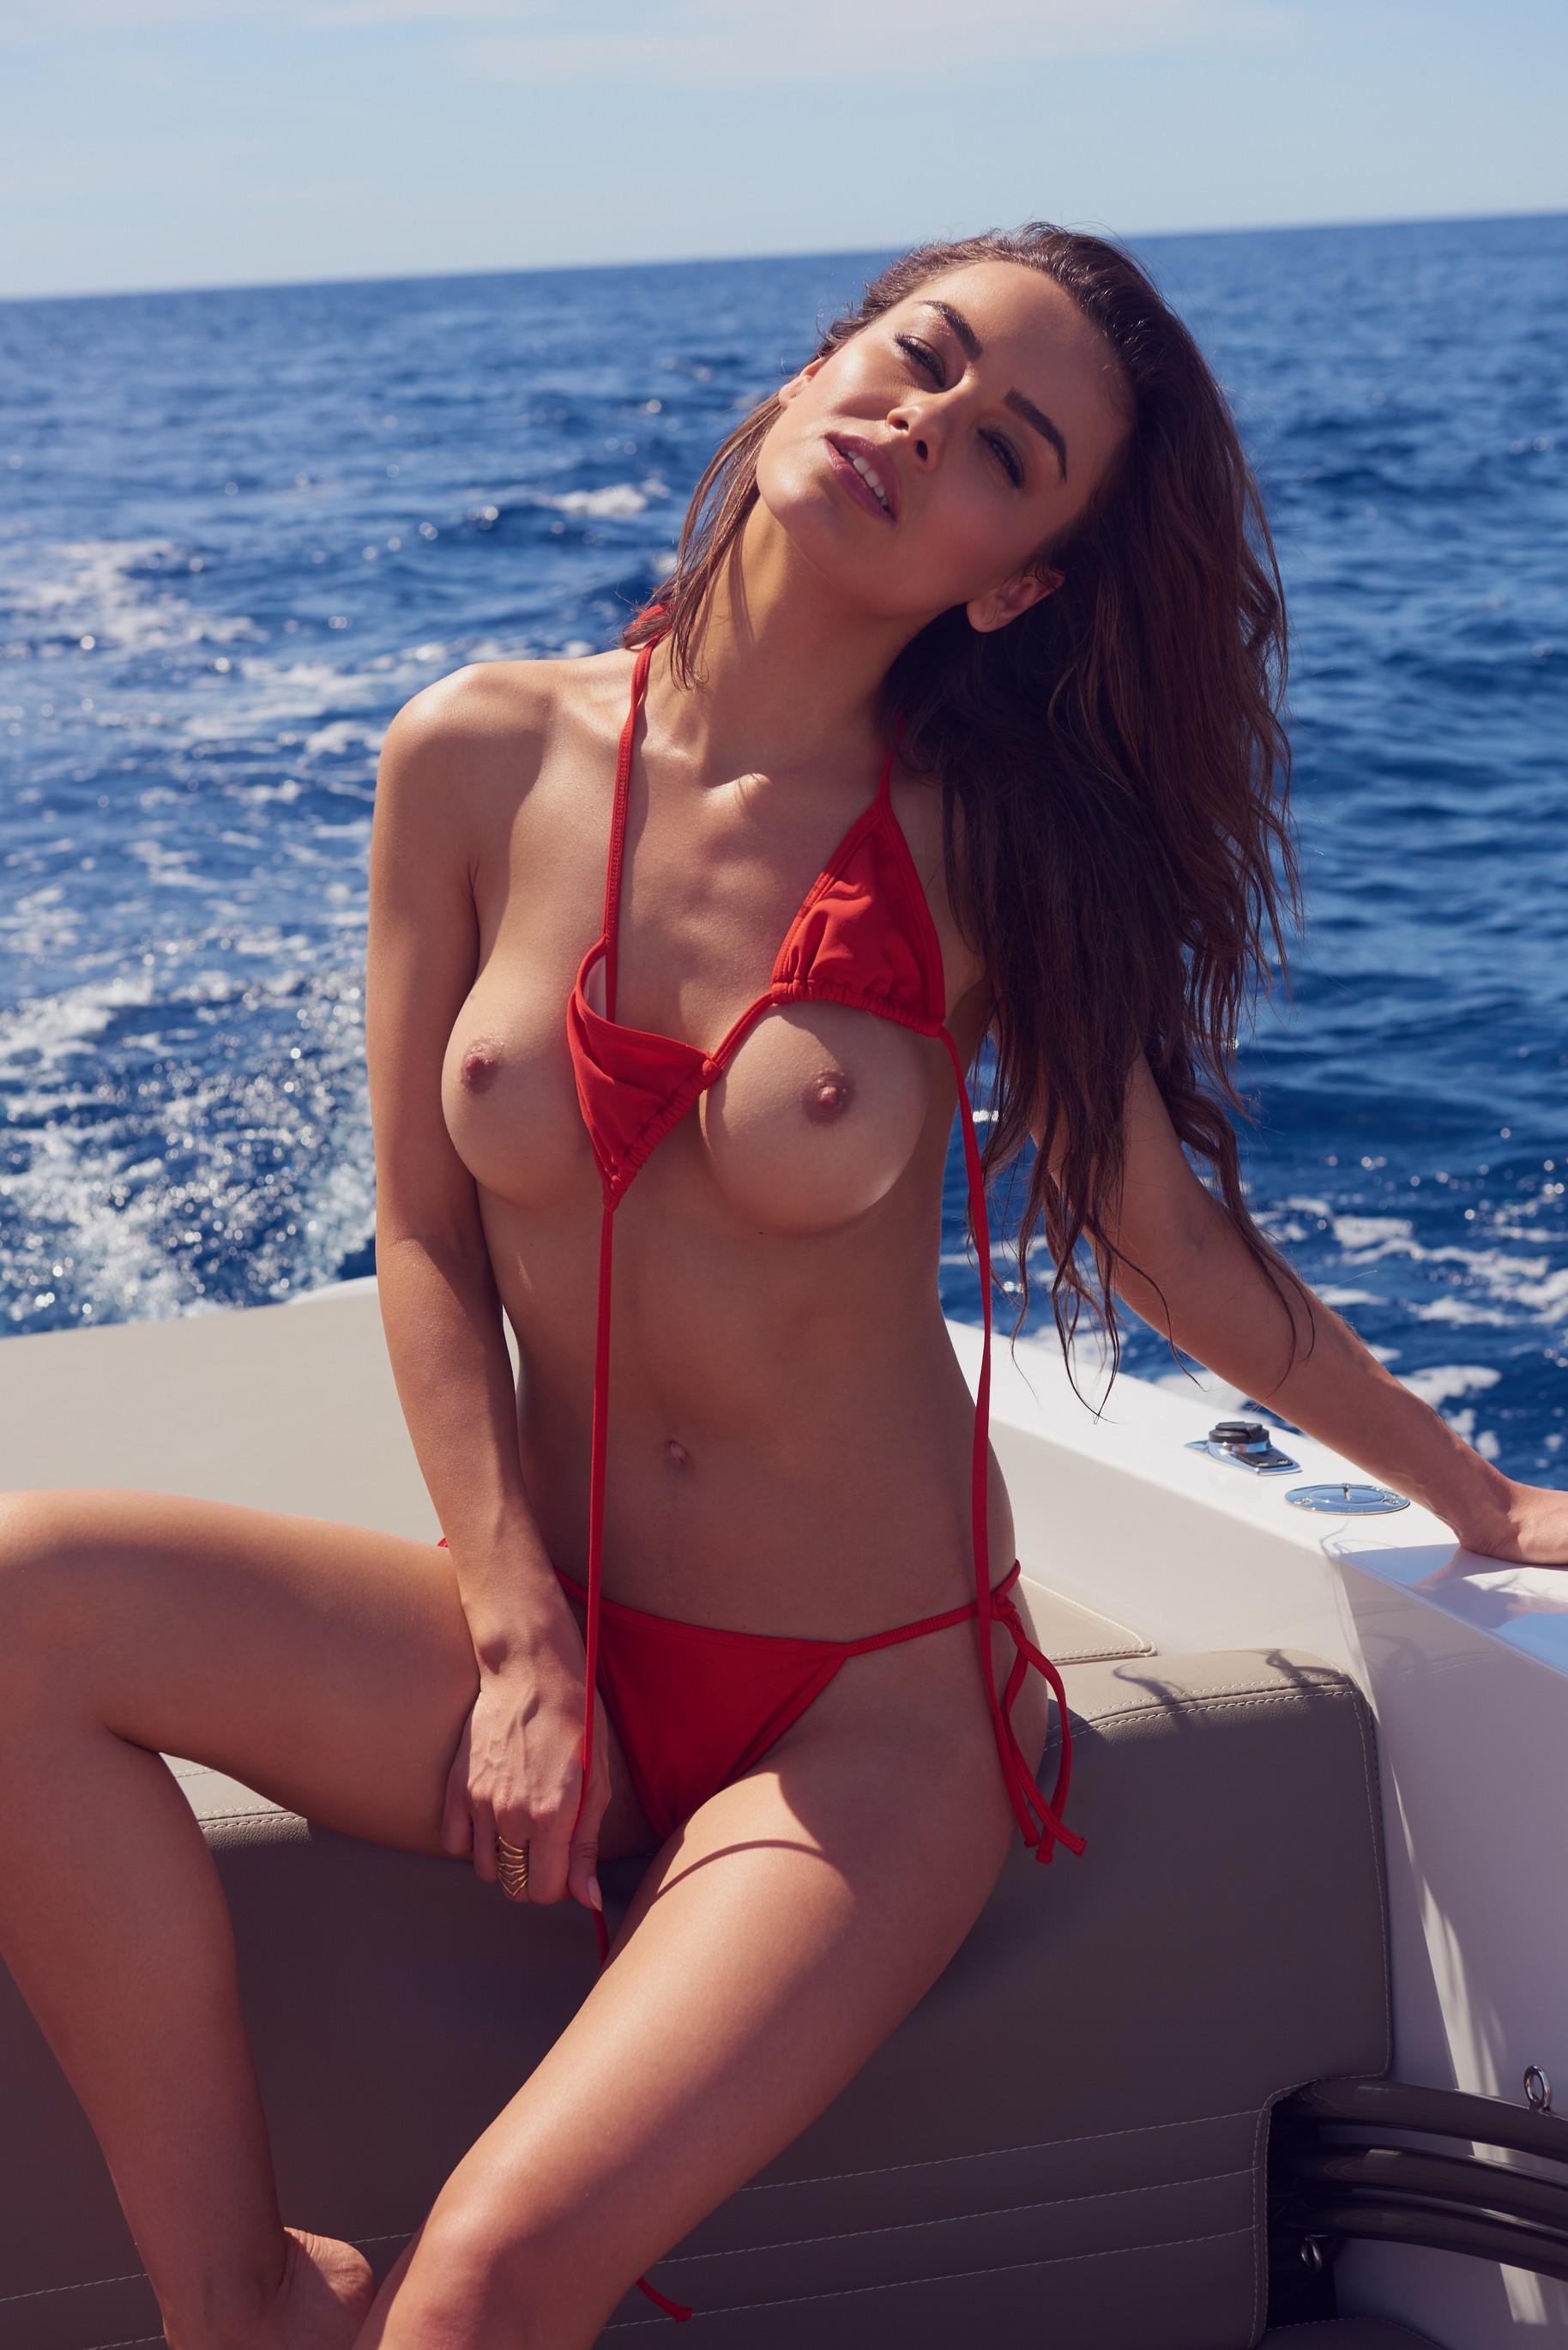 veronika-klimovits-naked-diving-motorboat-seaside-playboy-20